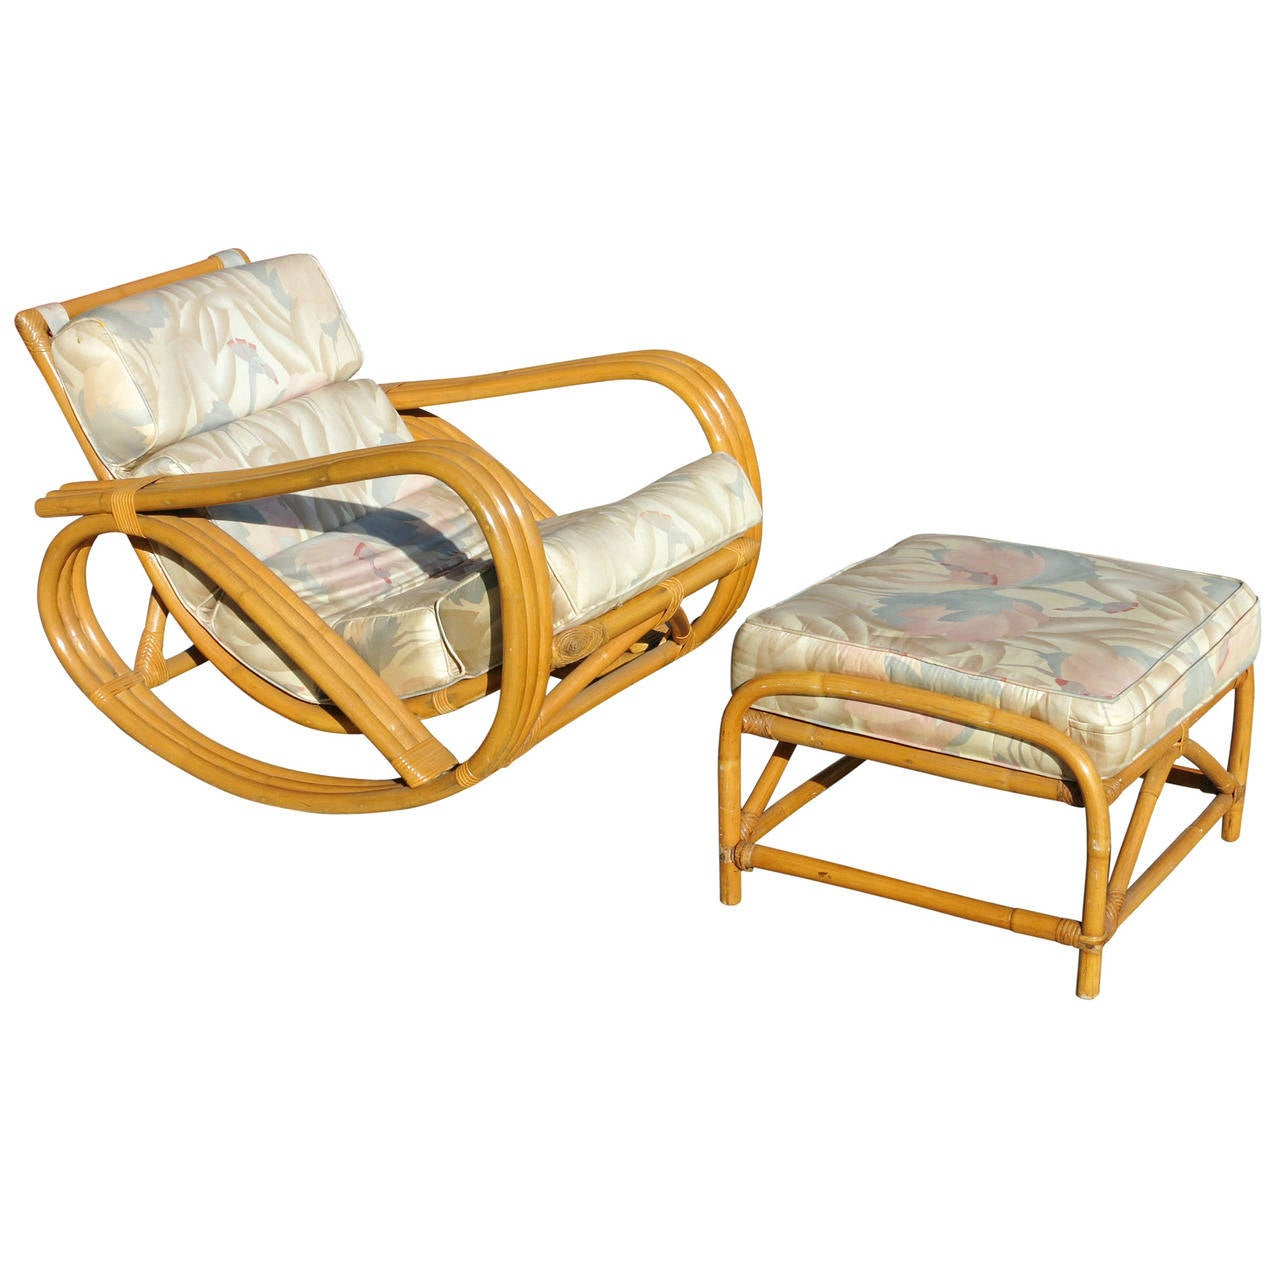 Rare Restored Pretzel Arm Rattan Rocking Chair with Ottoman